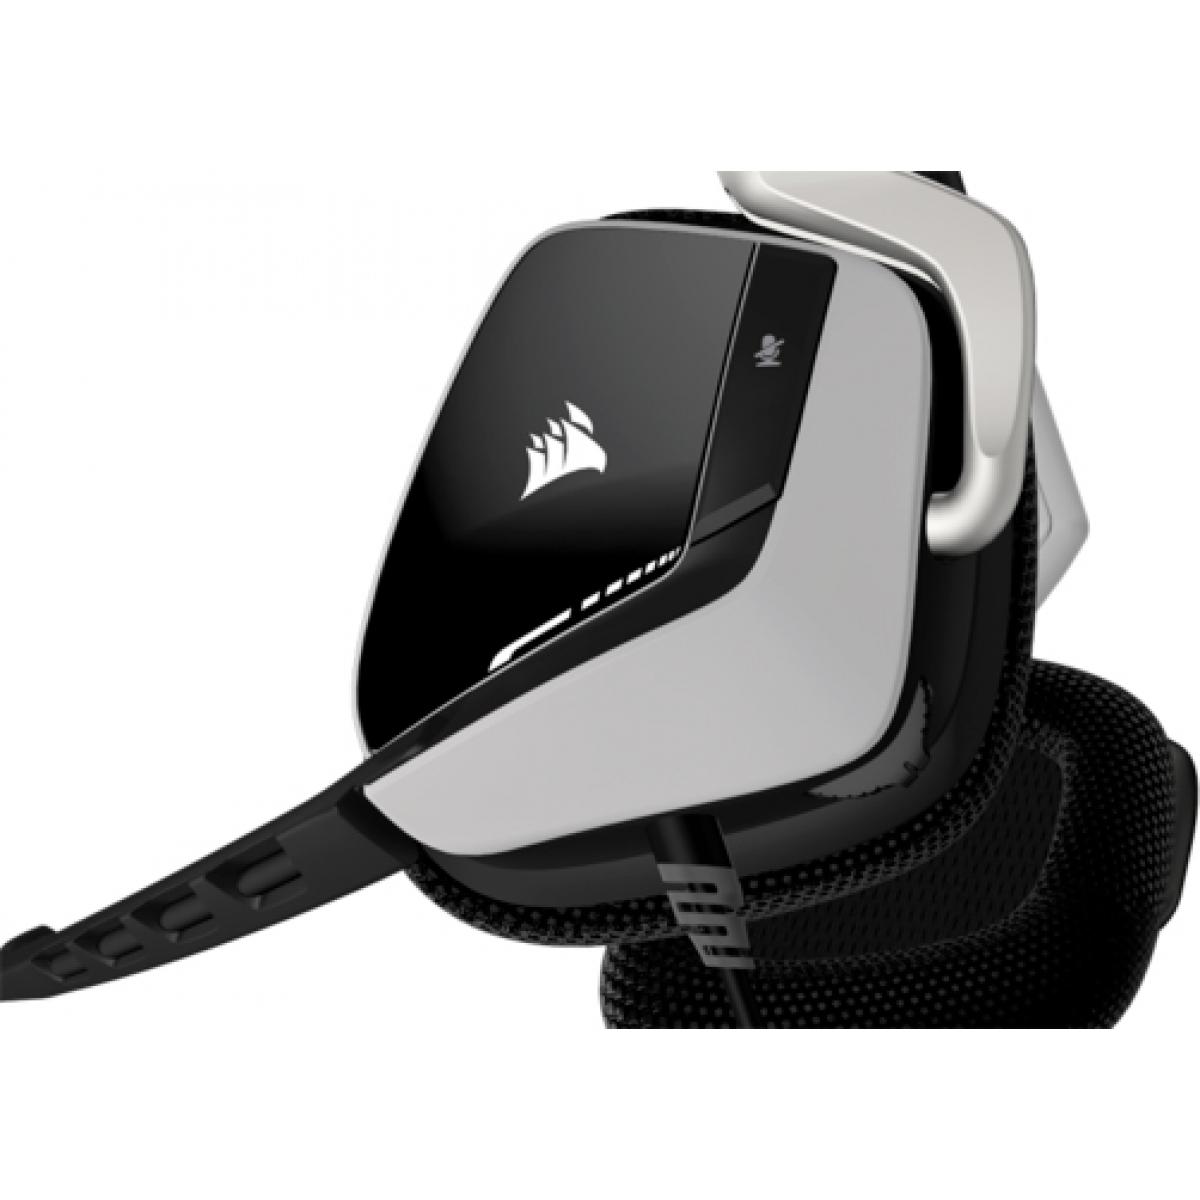 Headset Gamer Corsair VOID DOLBY 7.1 USB RGB CA-9011139-EU Branco